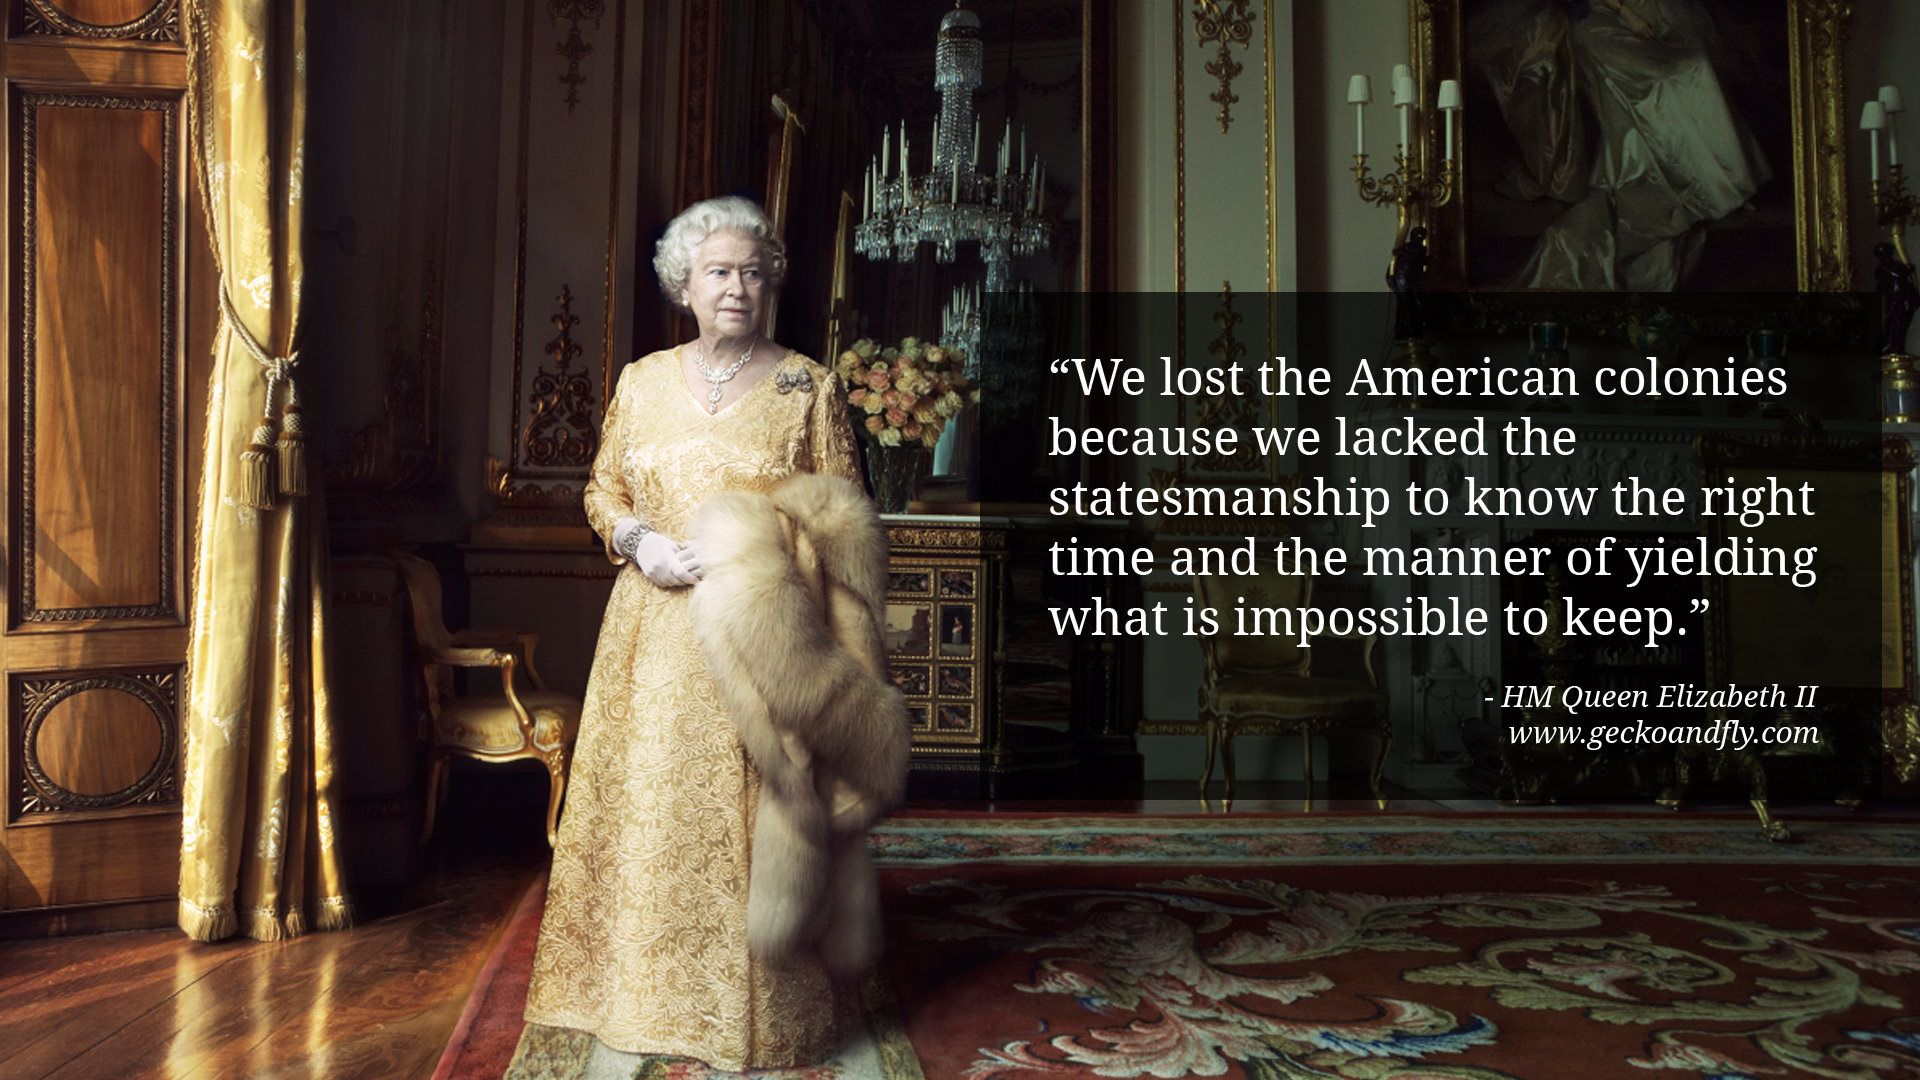 Pin By Katerina Tsitsonis On Queen Elizabeth Ii Queen Elizabeth Ii Quotes Queen Elizabeth Elizabeth Ii